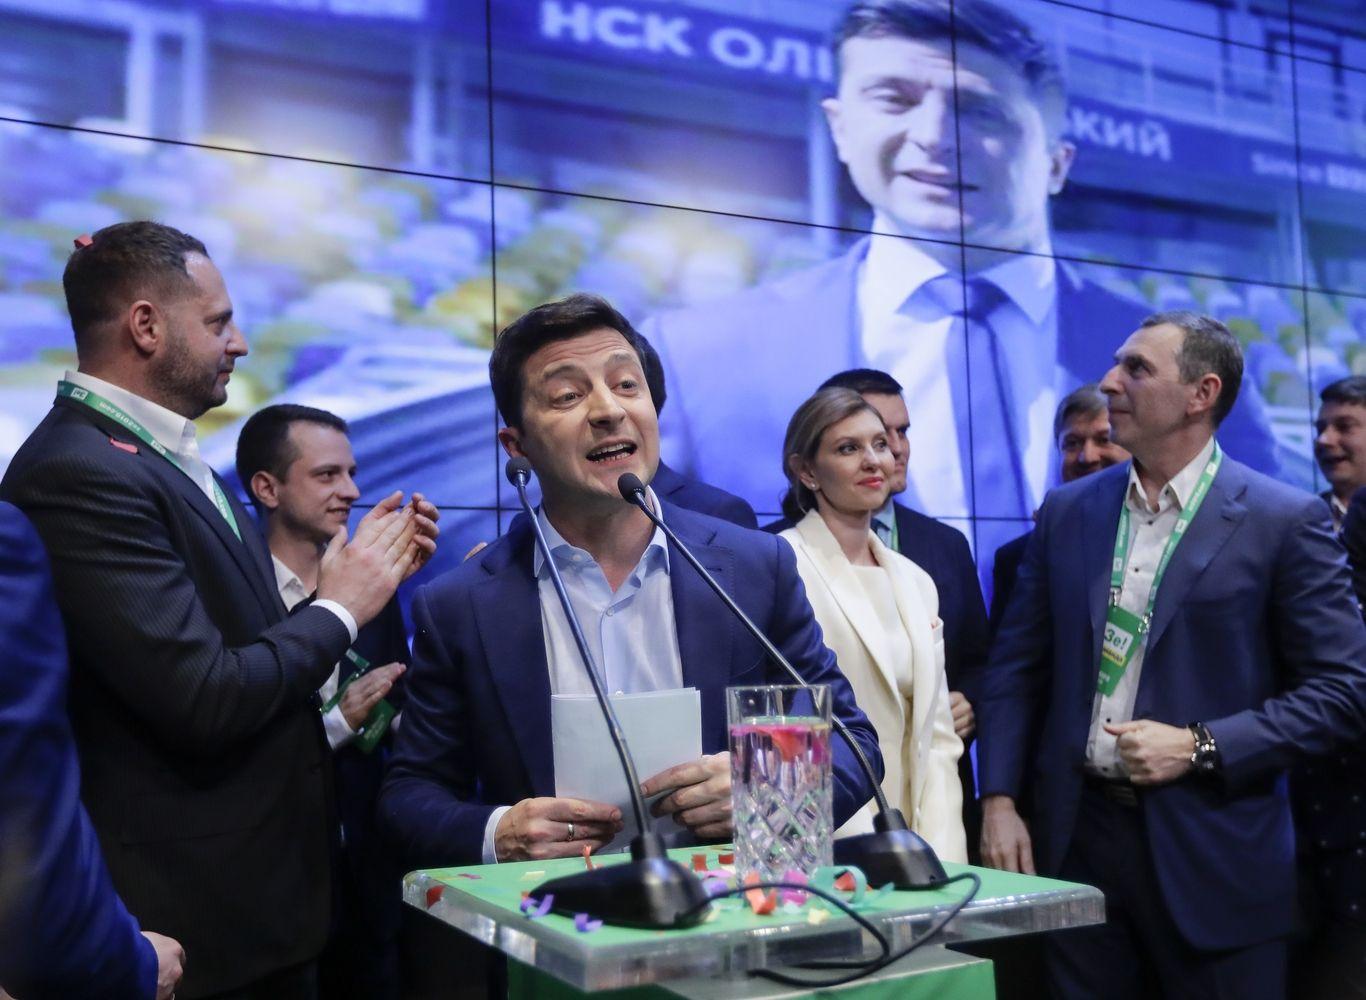 V. Zelenskio pergale rinkimuose neabejoja ir jo oponentas